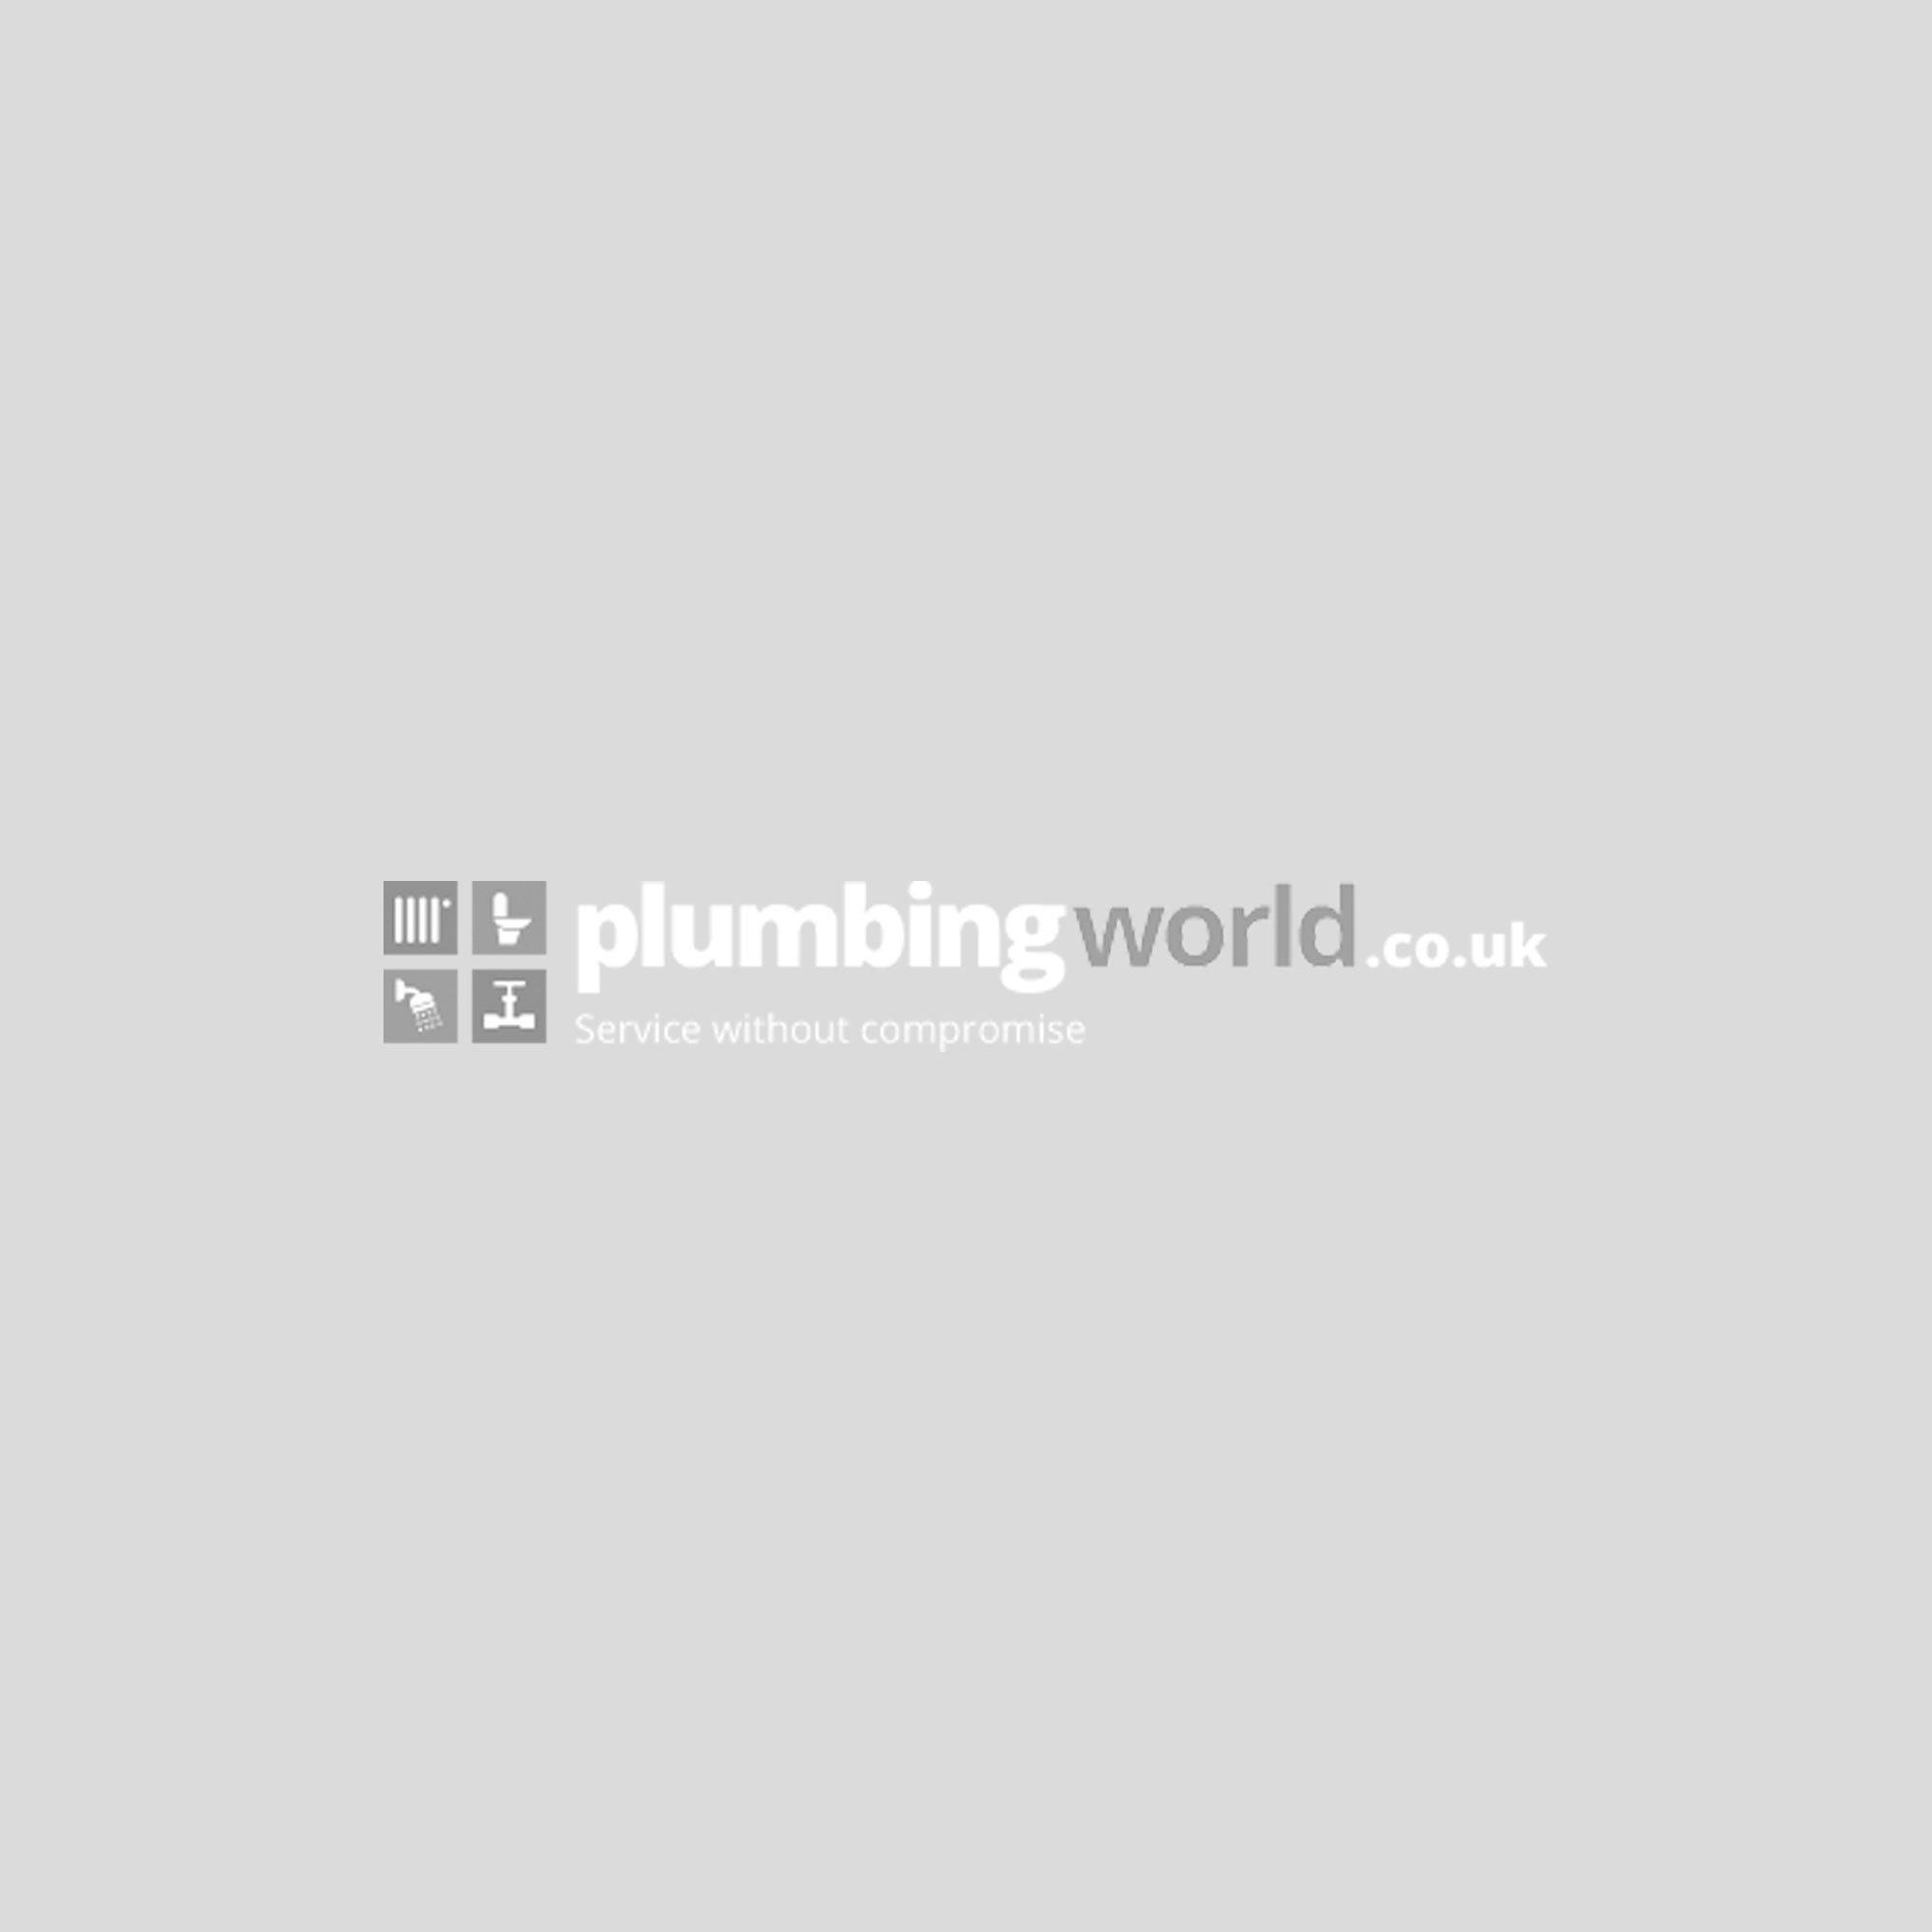 1200mm wide x 2400mm High x 10mm Depth PVC Shower Panel - Travertine Matt